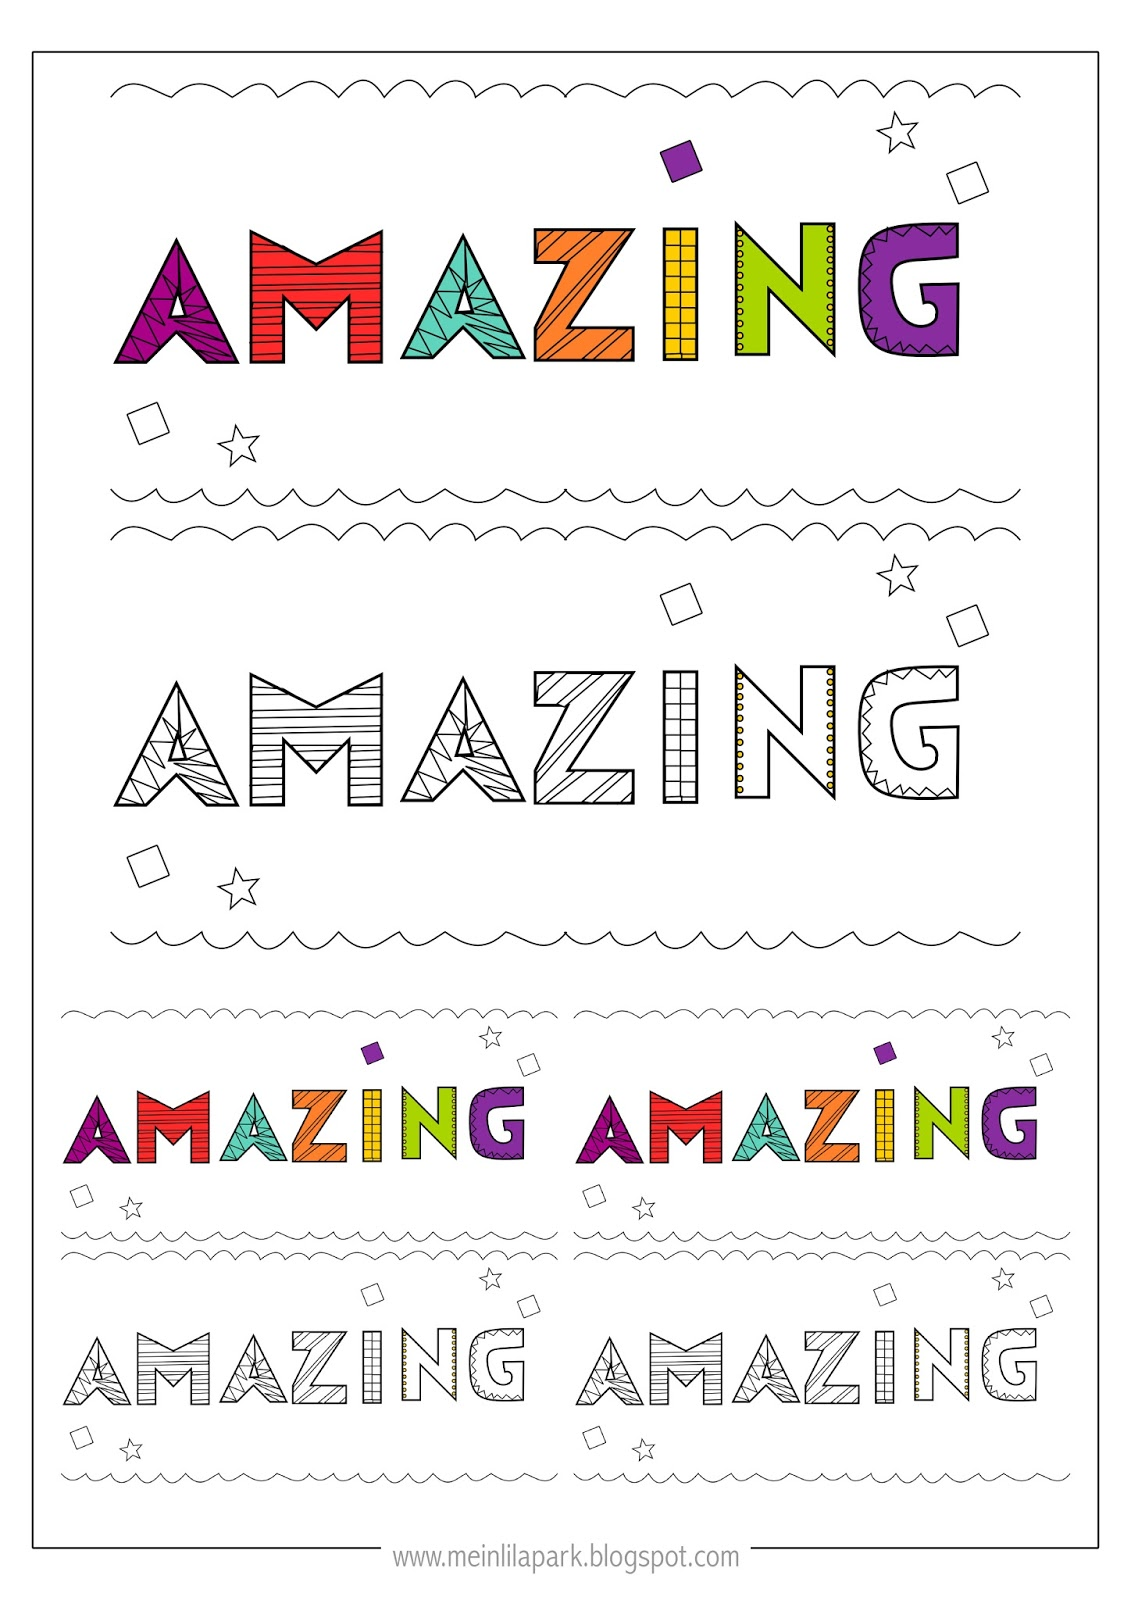 Amazing art gallery - Extra photo art |Marvelous Word Art